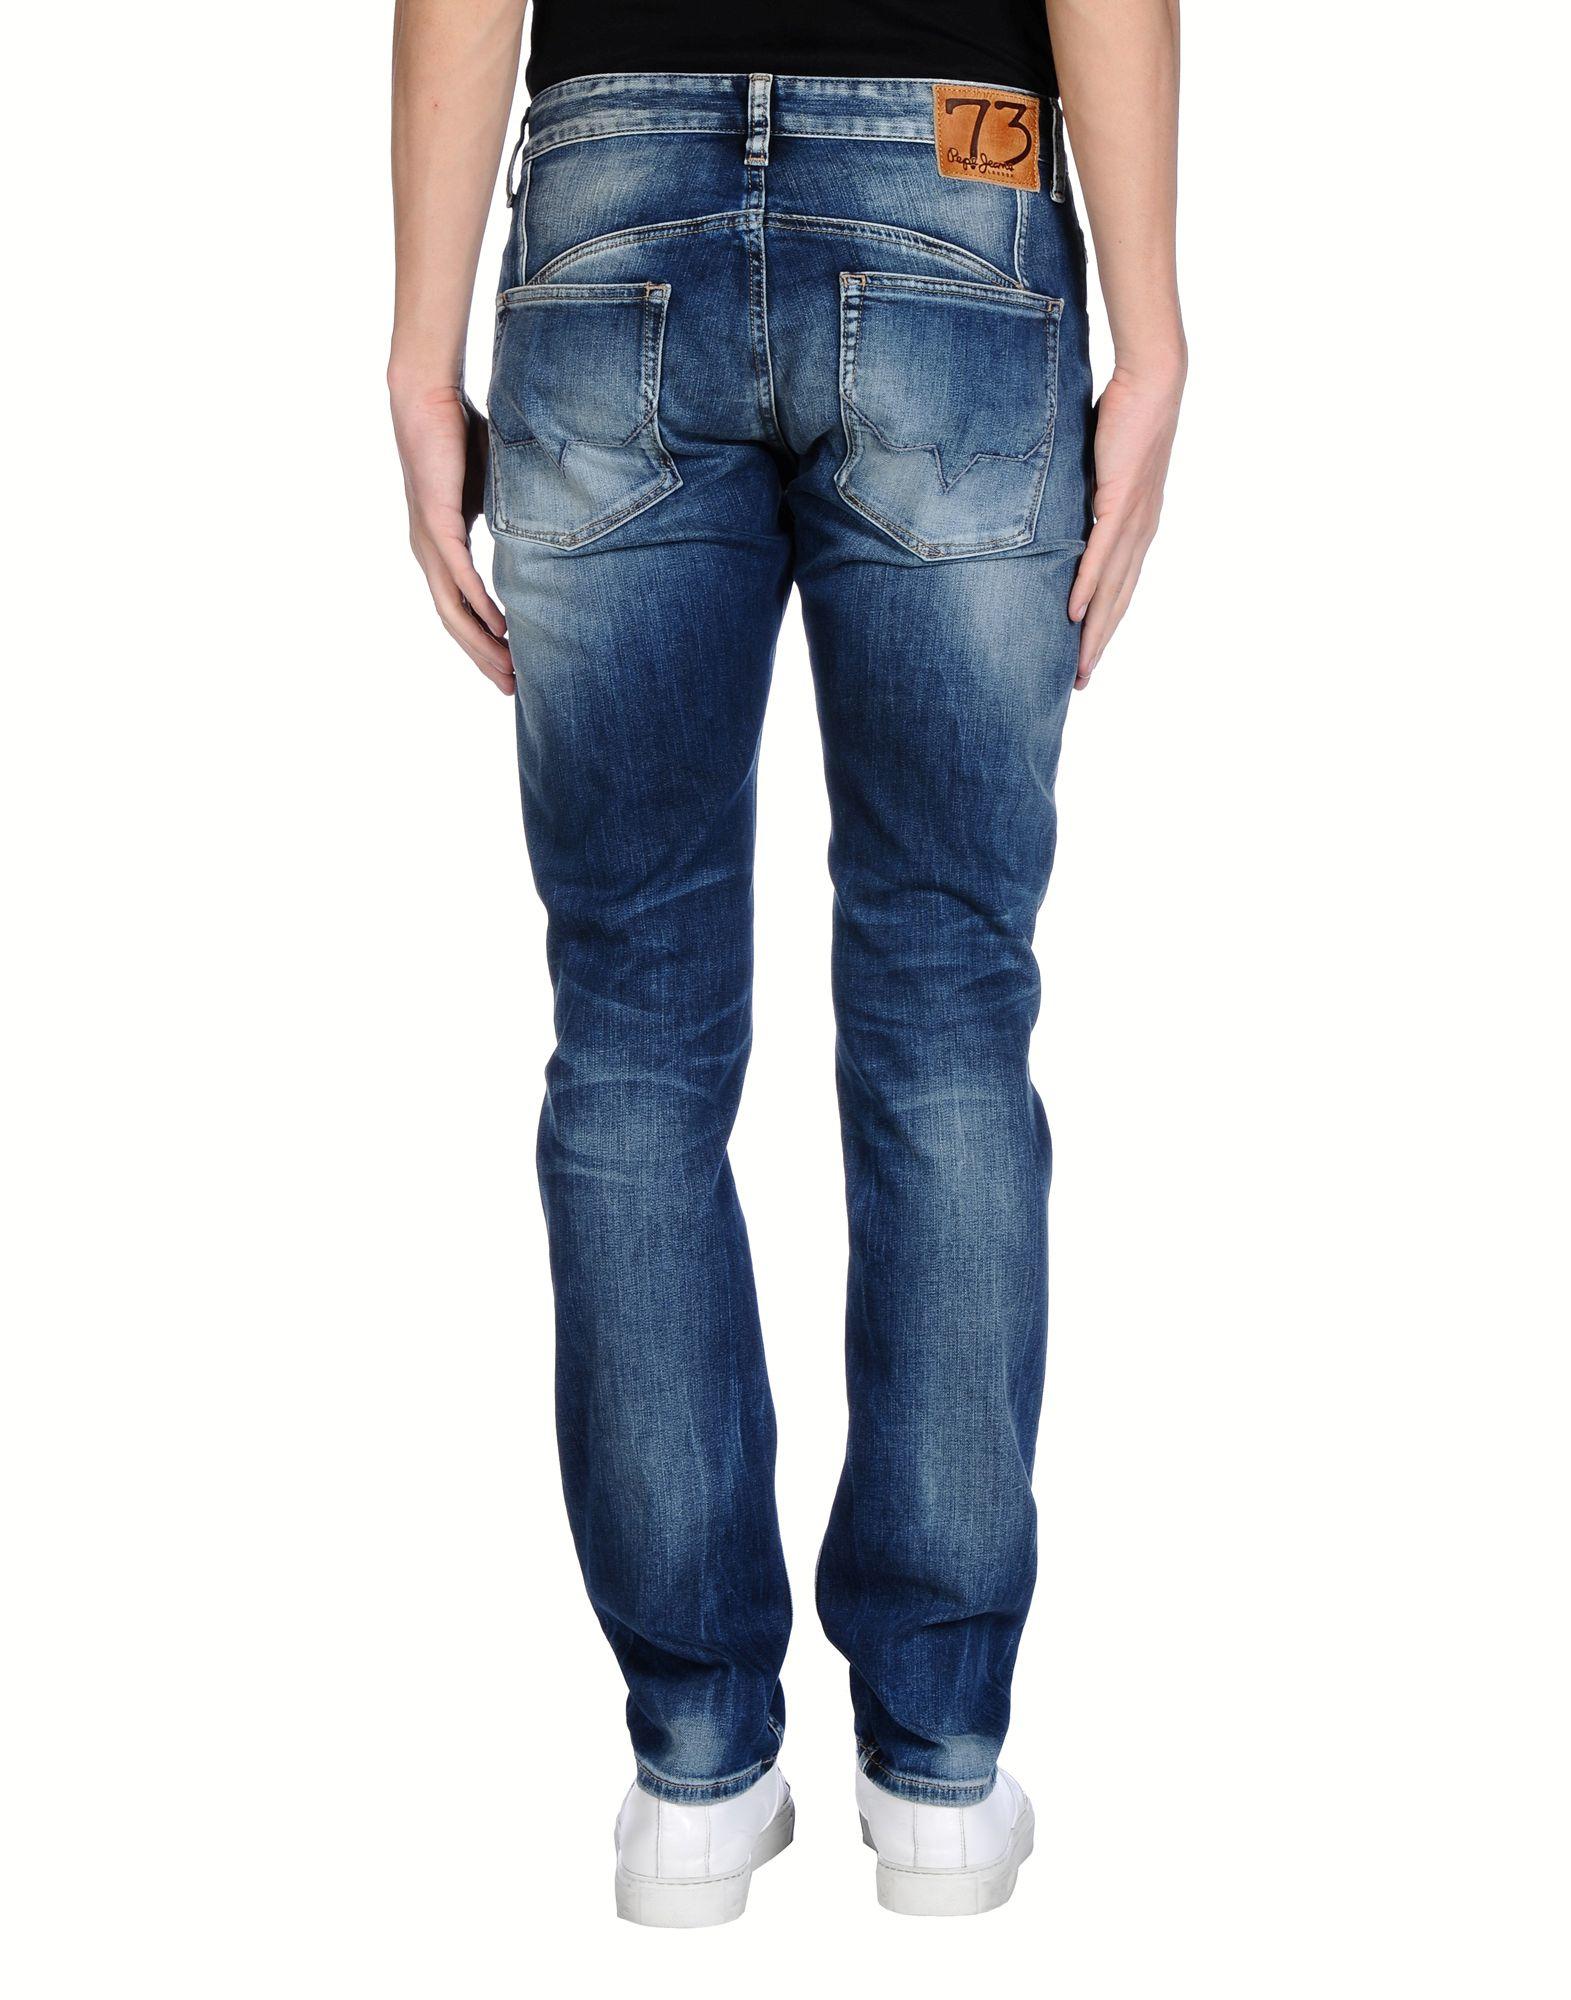 lyst pepe jeans denim trousers in blue for men. Black Bedroom Furniture Sets. Home Design Ideas